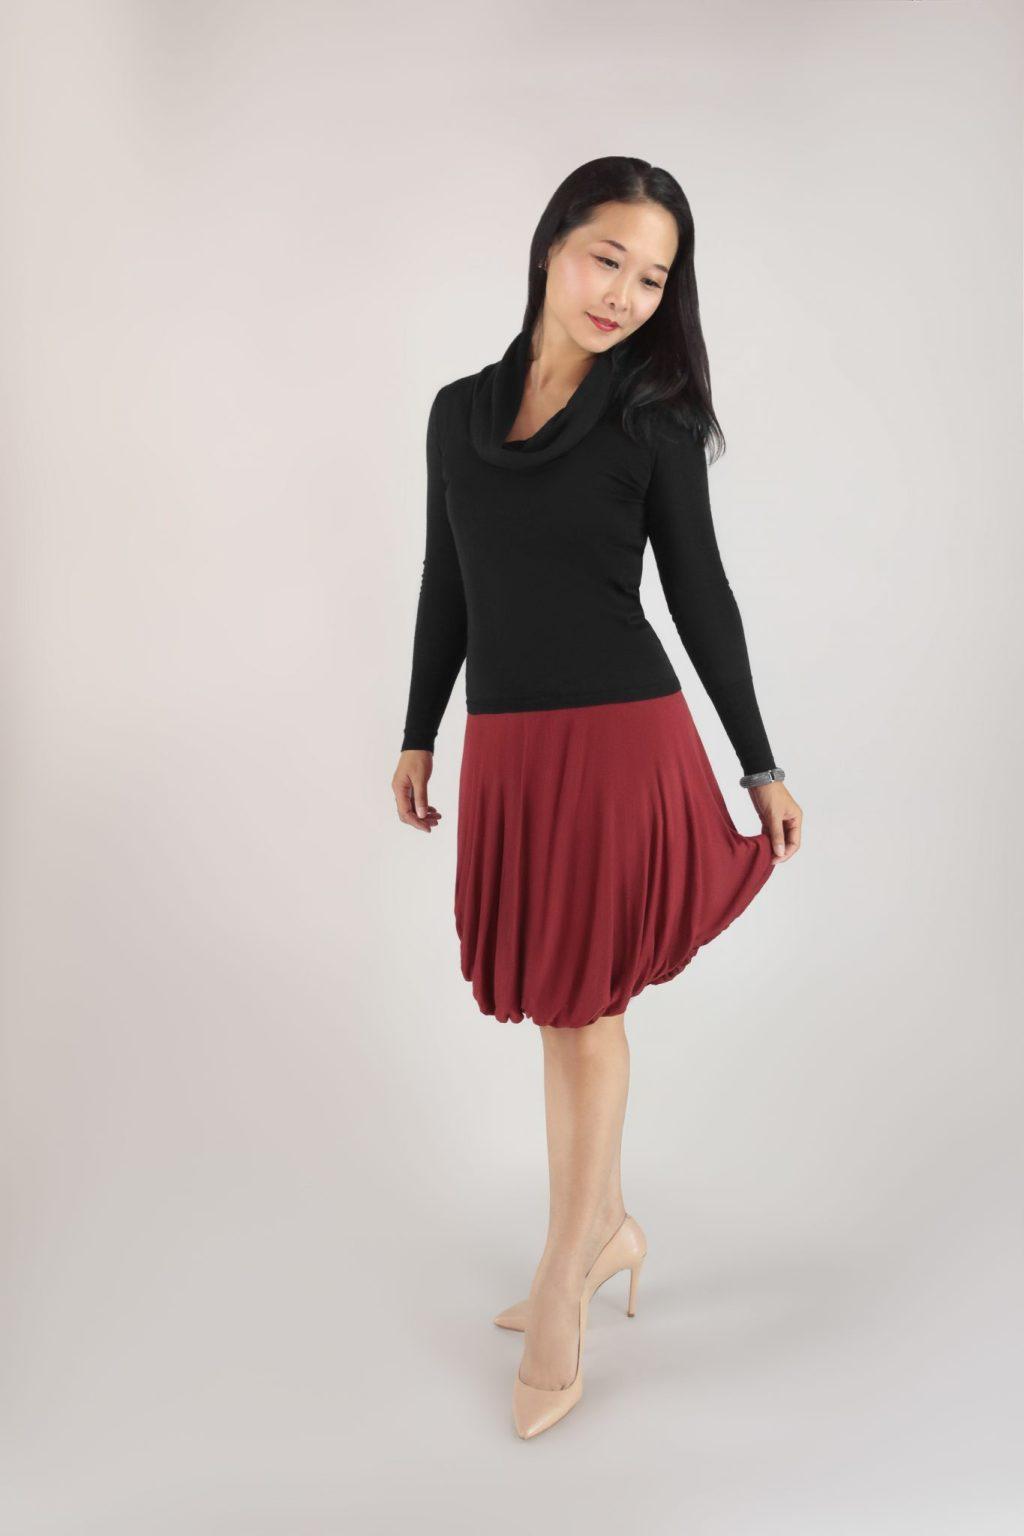 Bella Sunshine Designs' Kelly's Twirly Skirt